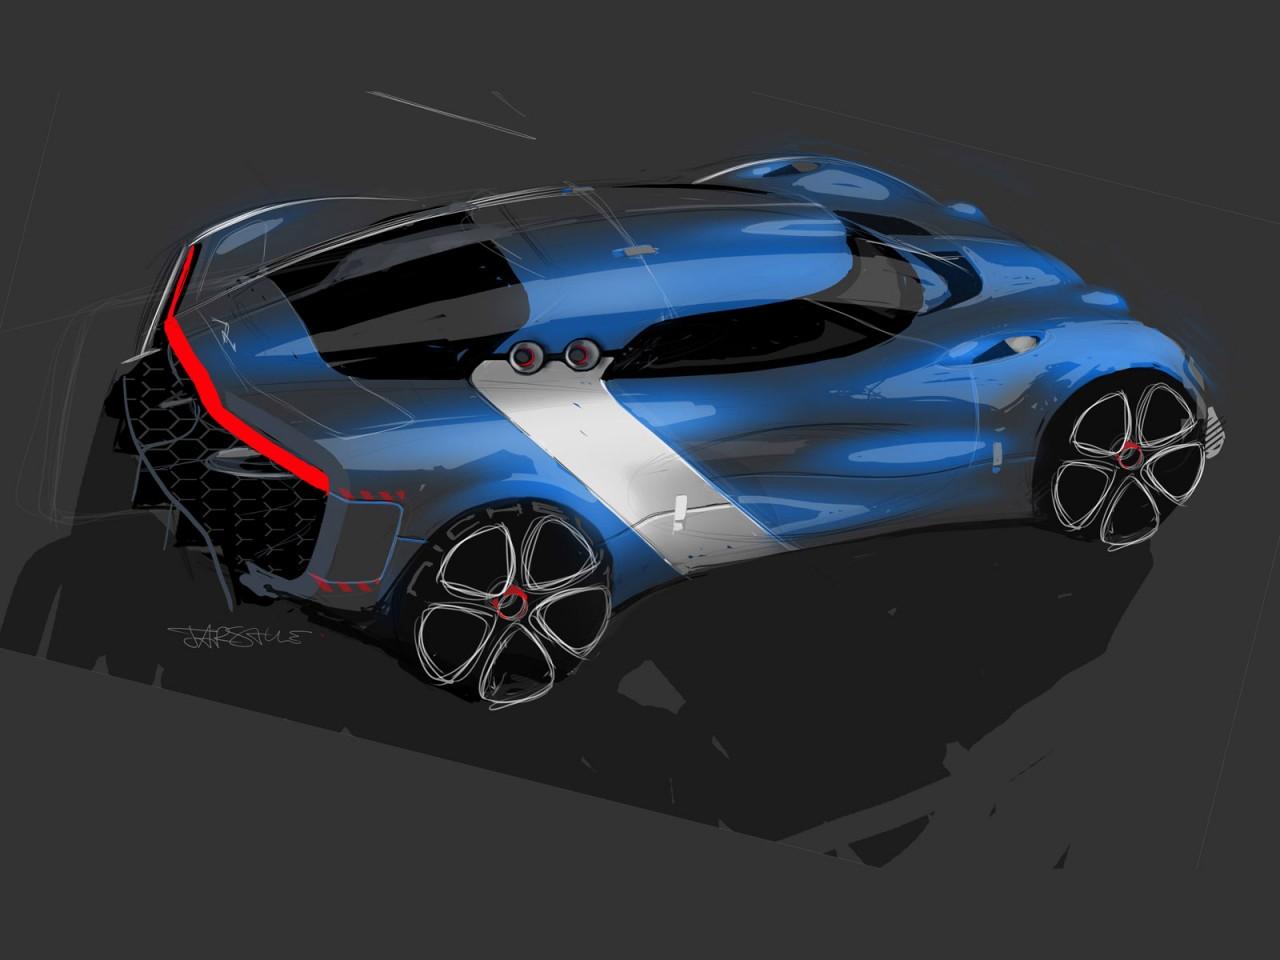 Renault-Alpine-A110-50-Concept-Design-Sketch-02